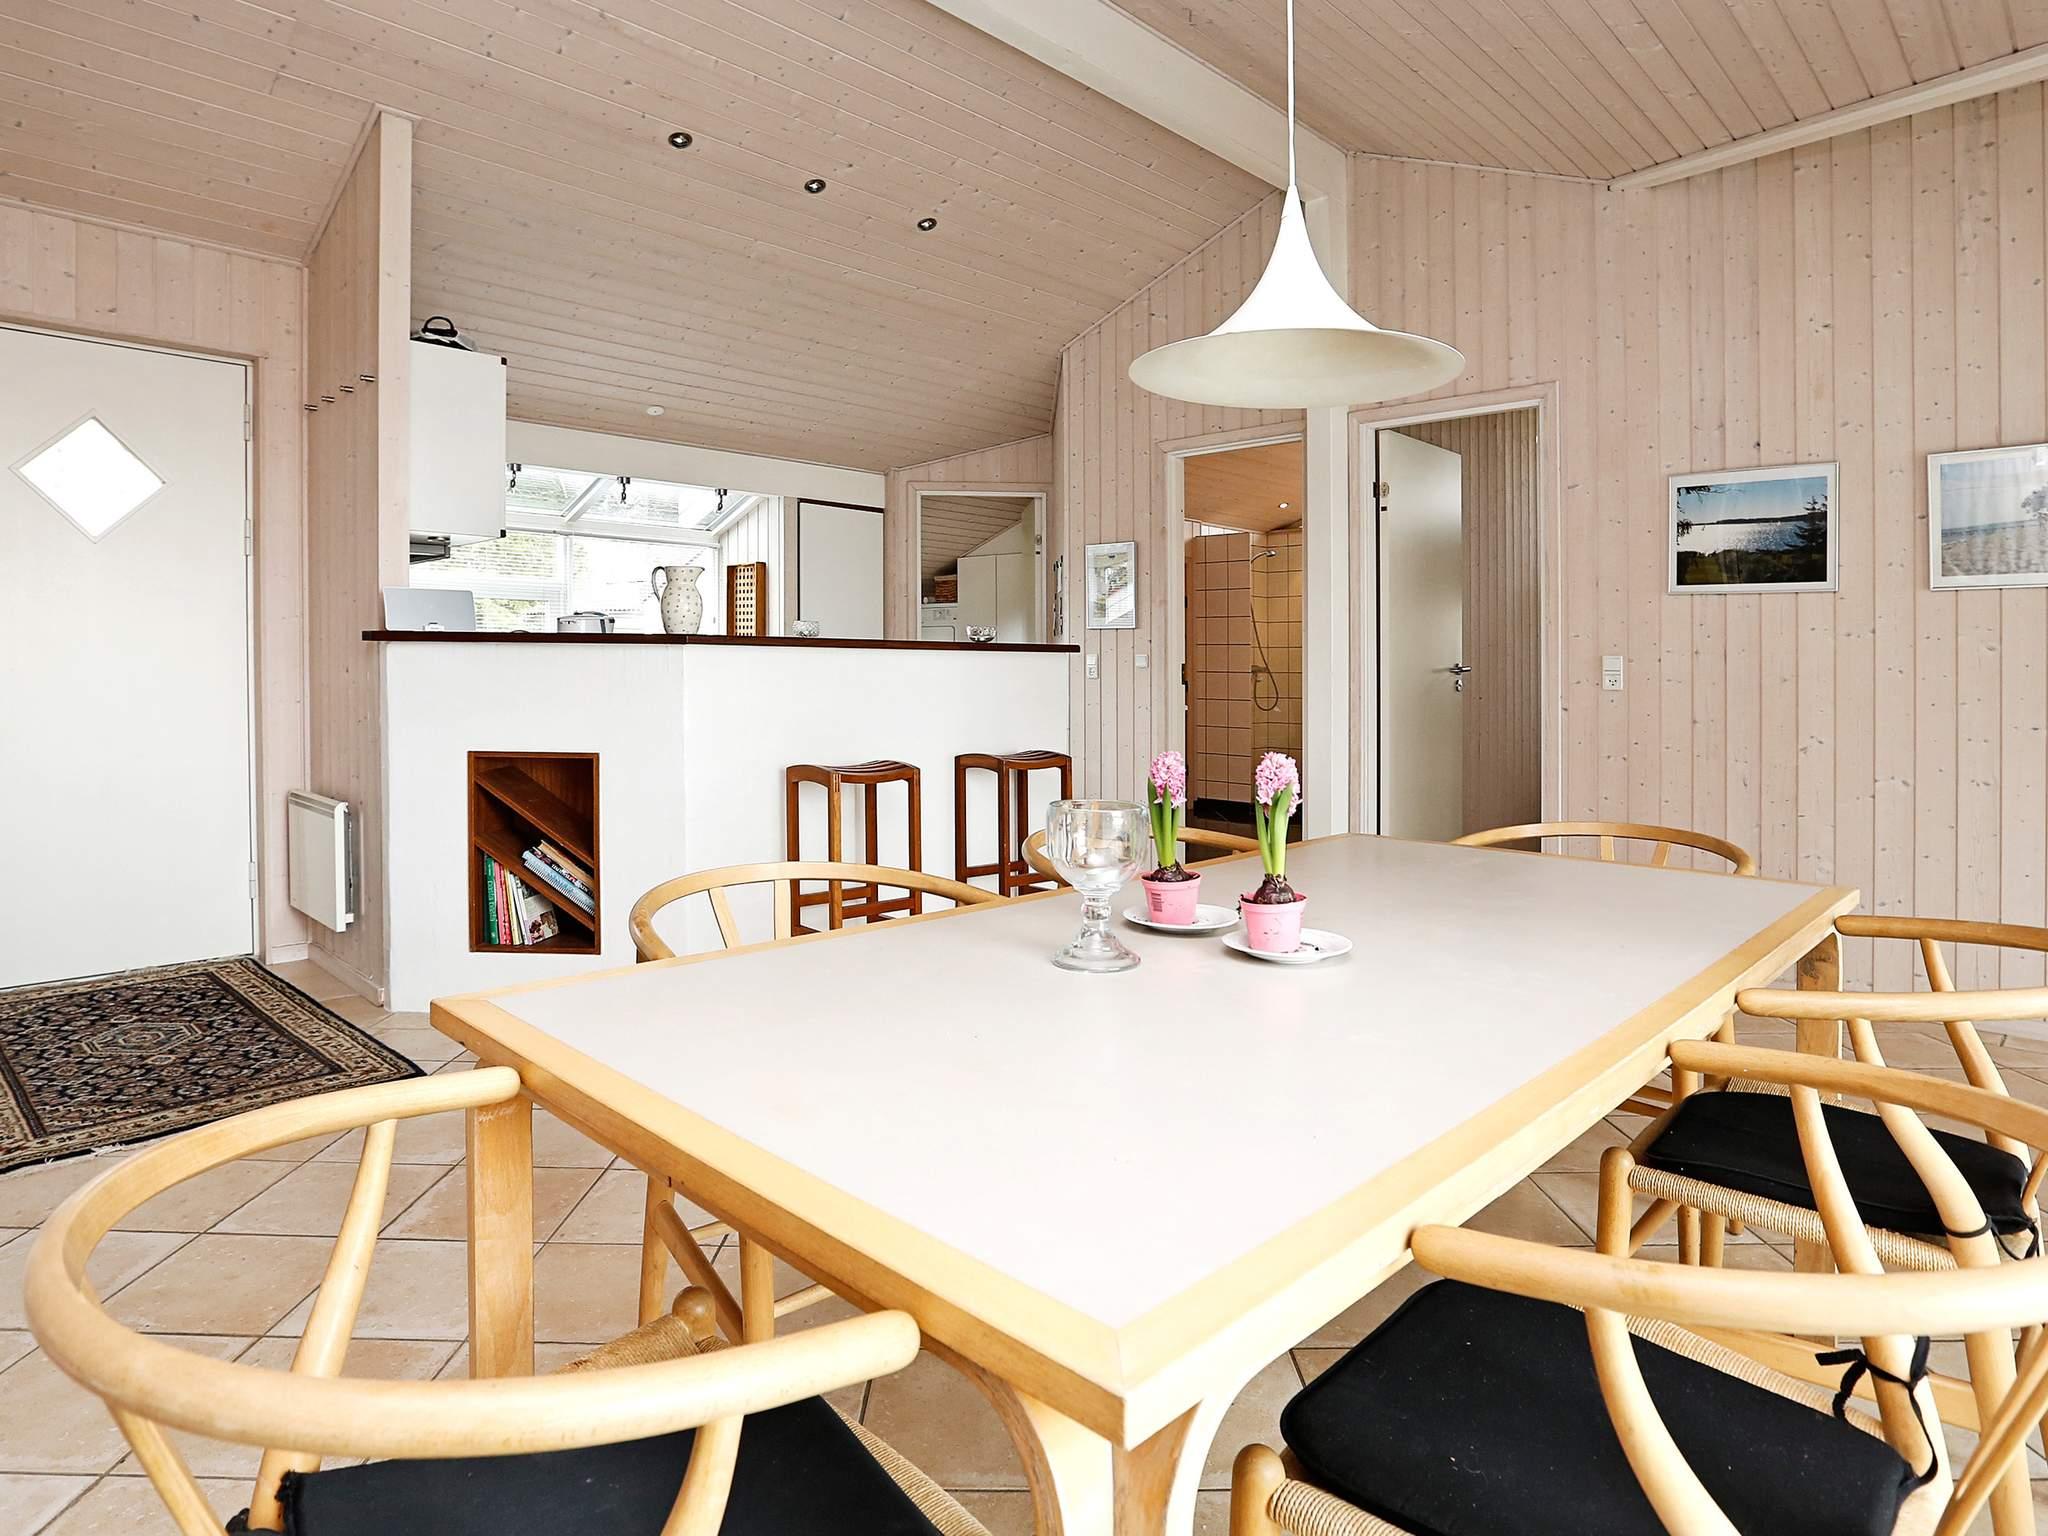 Maison de vacances Skibby (124927), Kirke Hyllinge, , Seeland Nord, Danemark, image 5